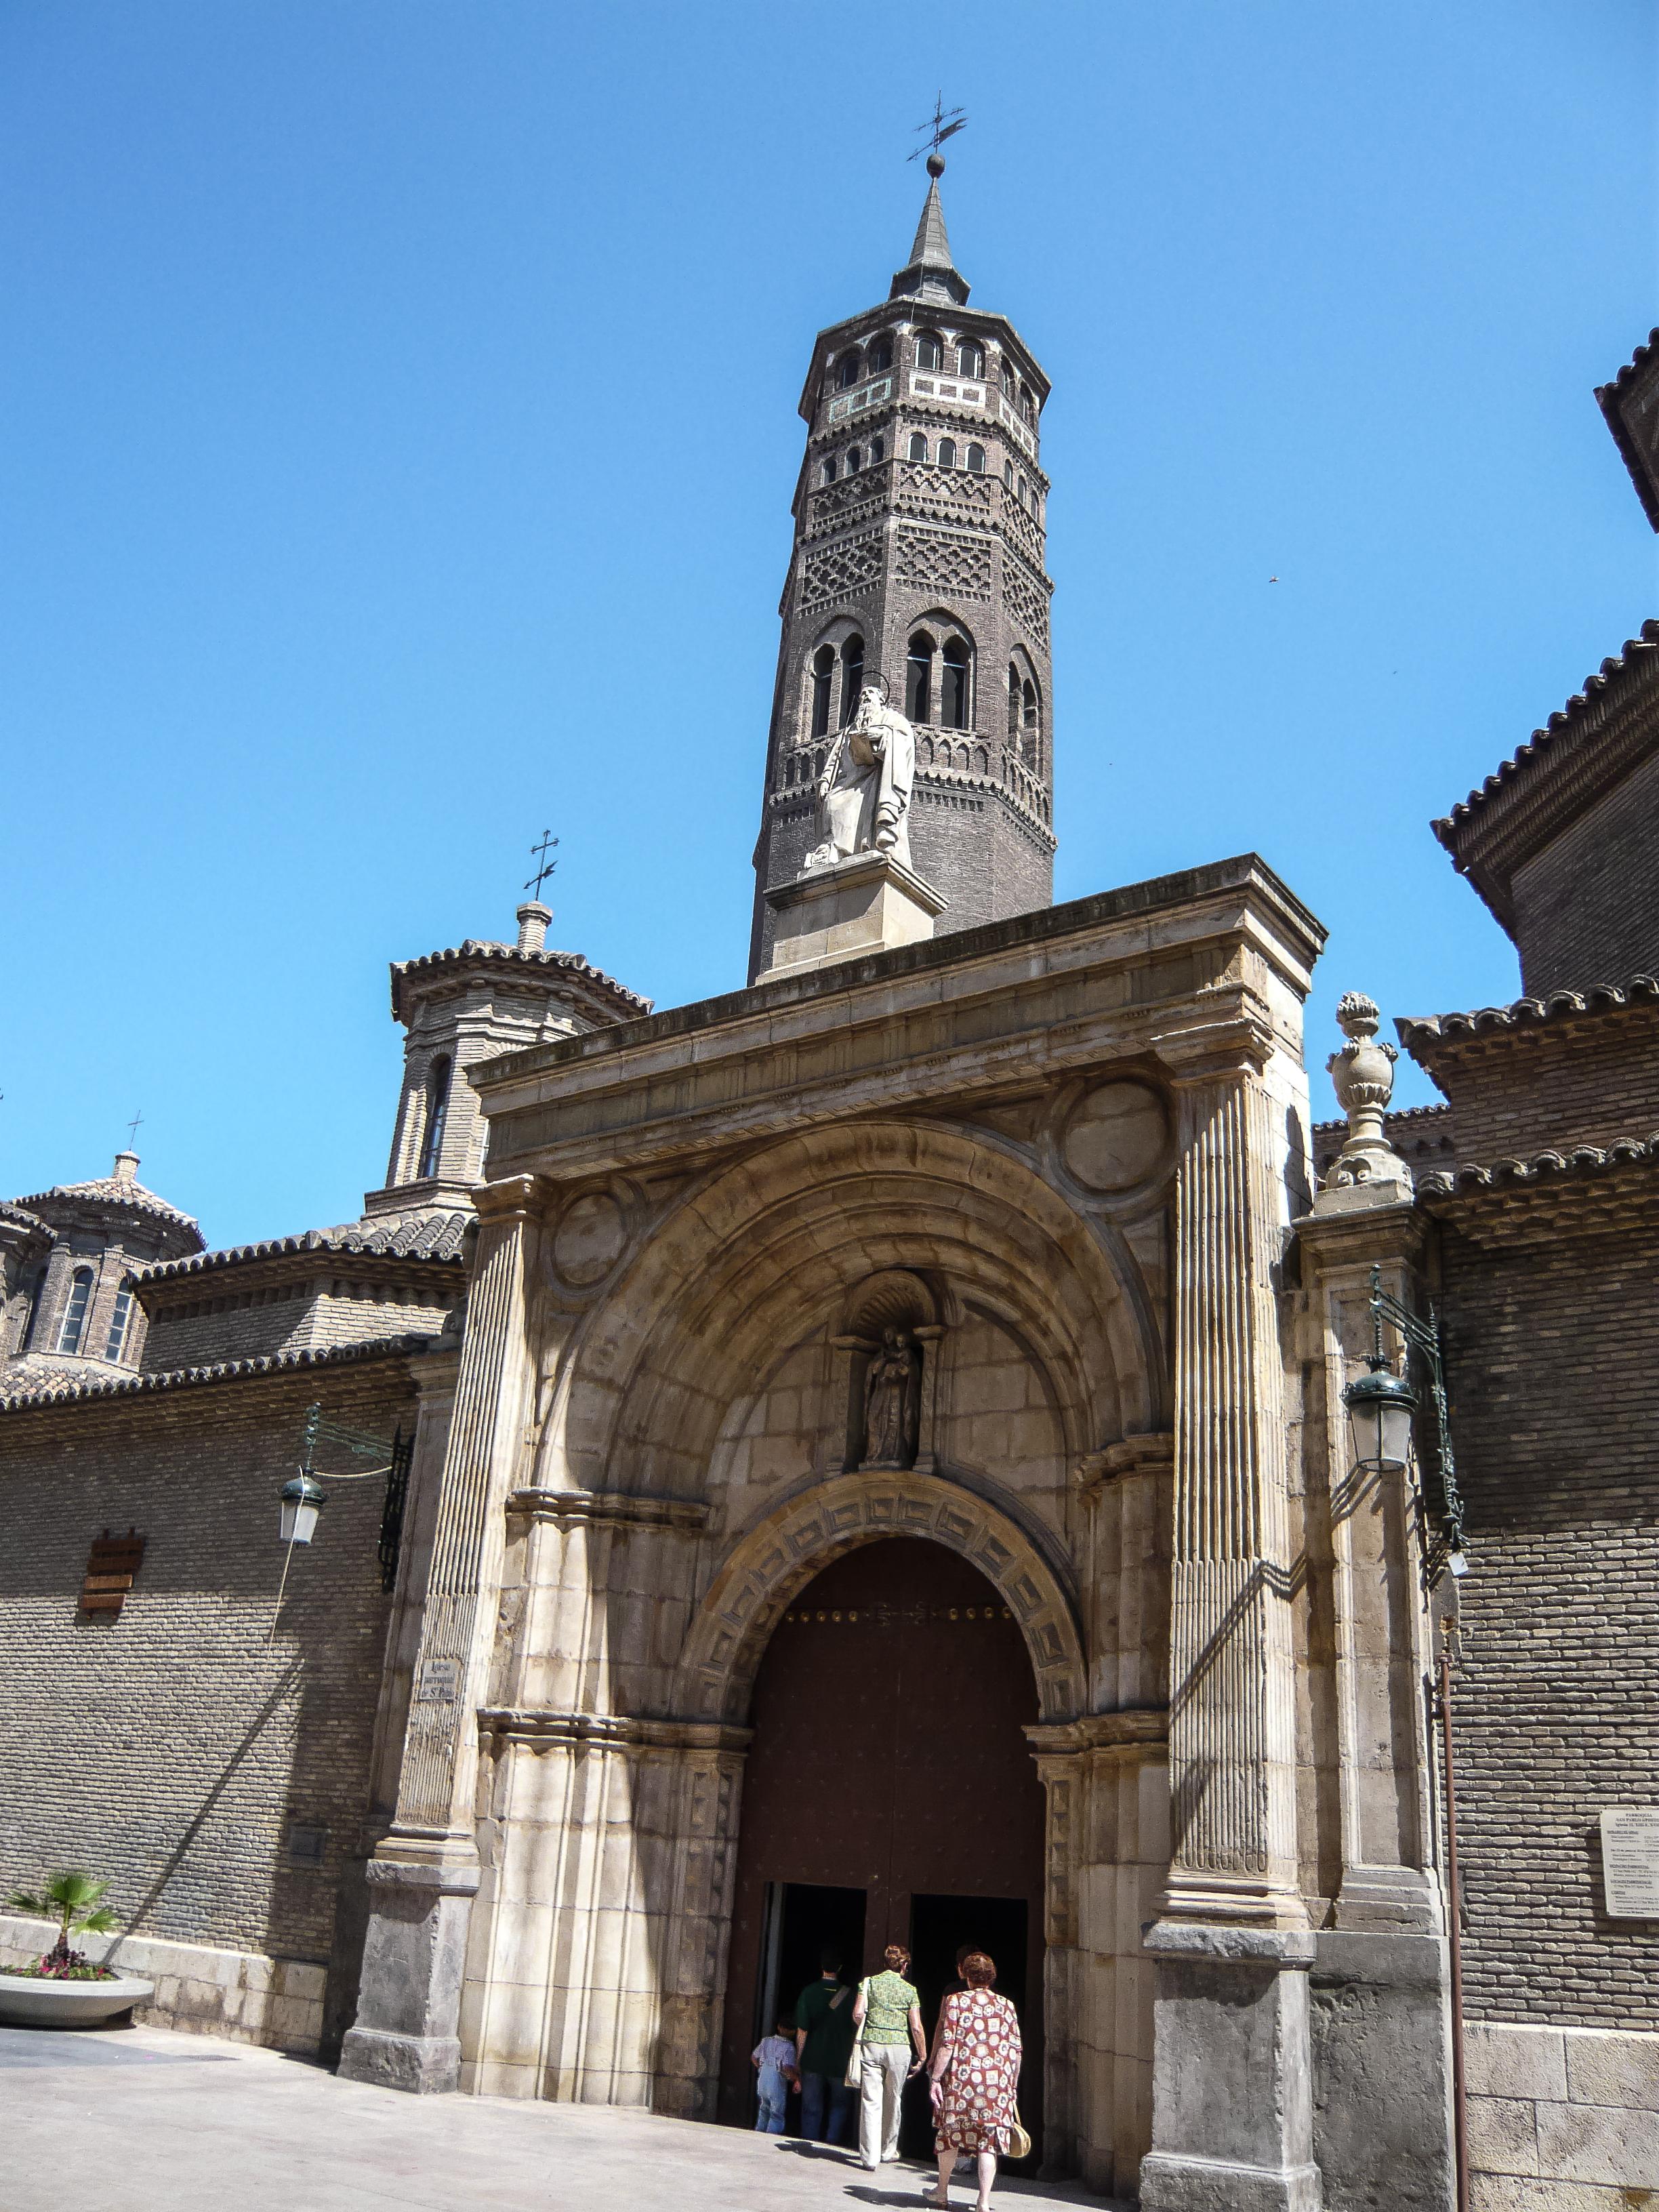 Iglesia de San Pablo (Zaragoza) - Wikipedia, la enciclopedia libre